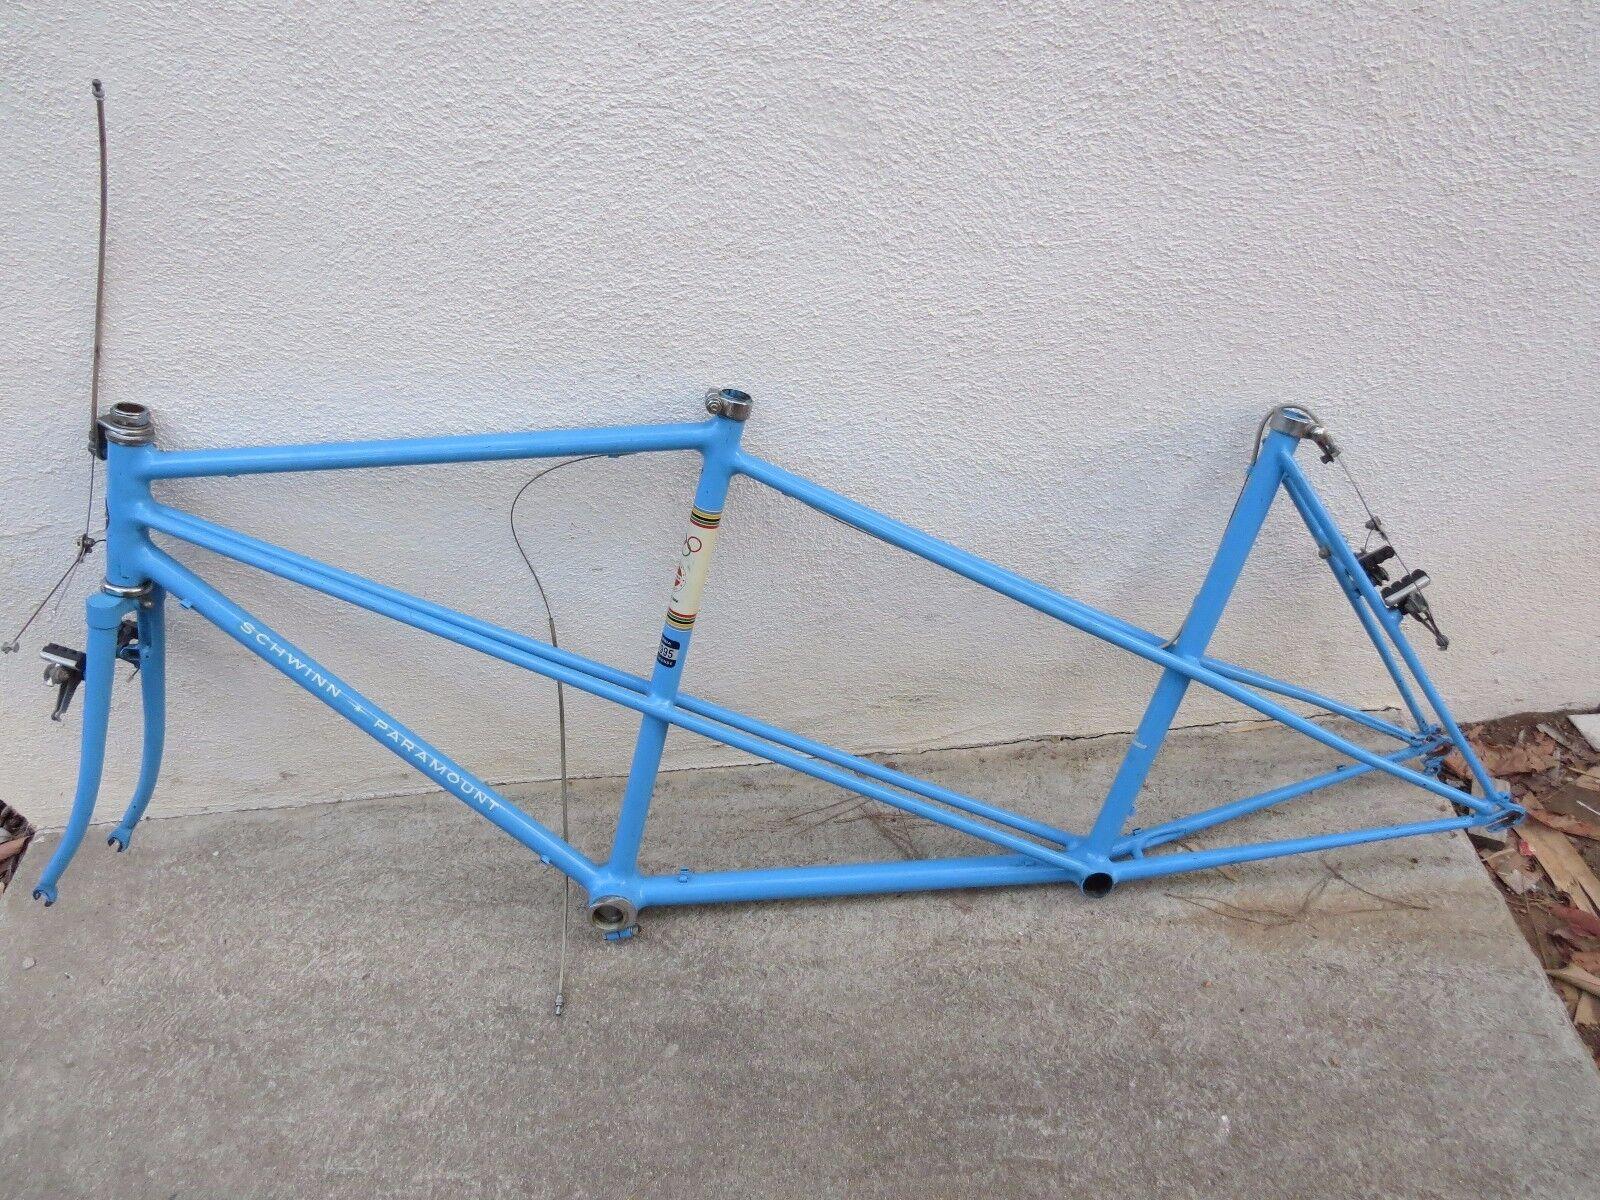 1972 SCHWINN  57 cm  56 cm rear PARAMOUNT FRAME FORK ROAD BICYCLE TANDEM VINTAGE  best price